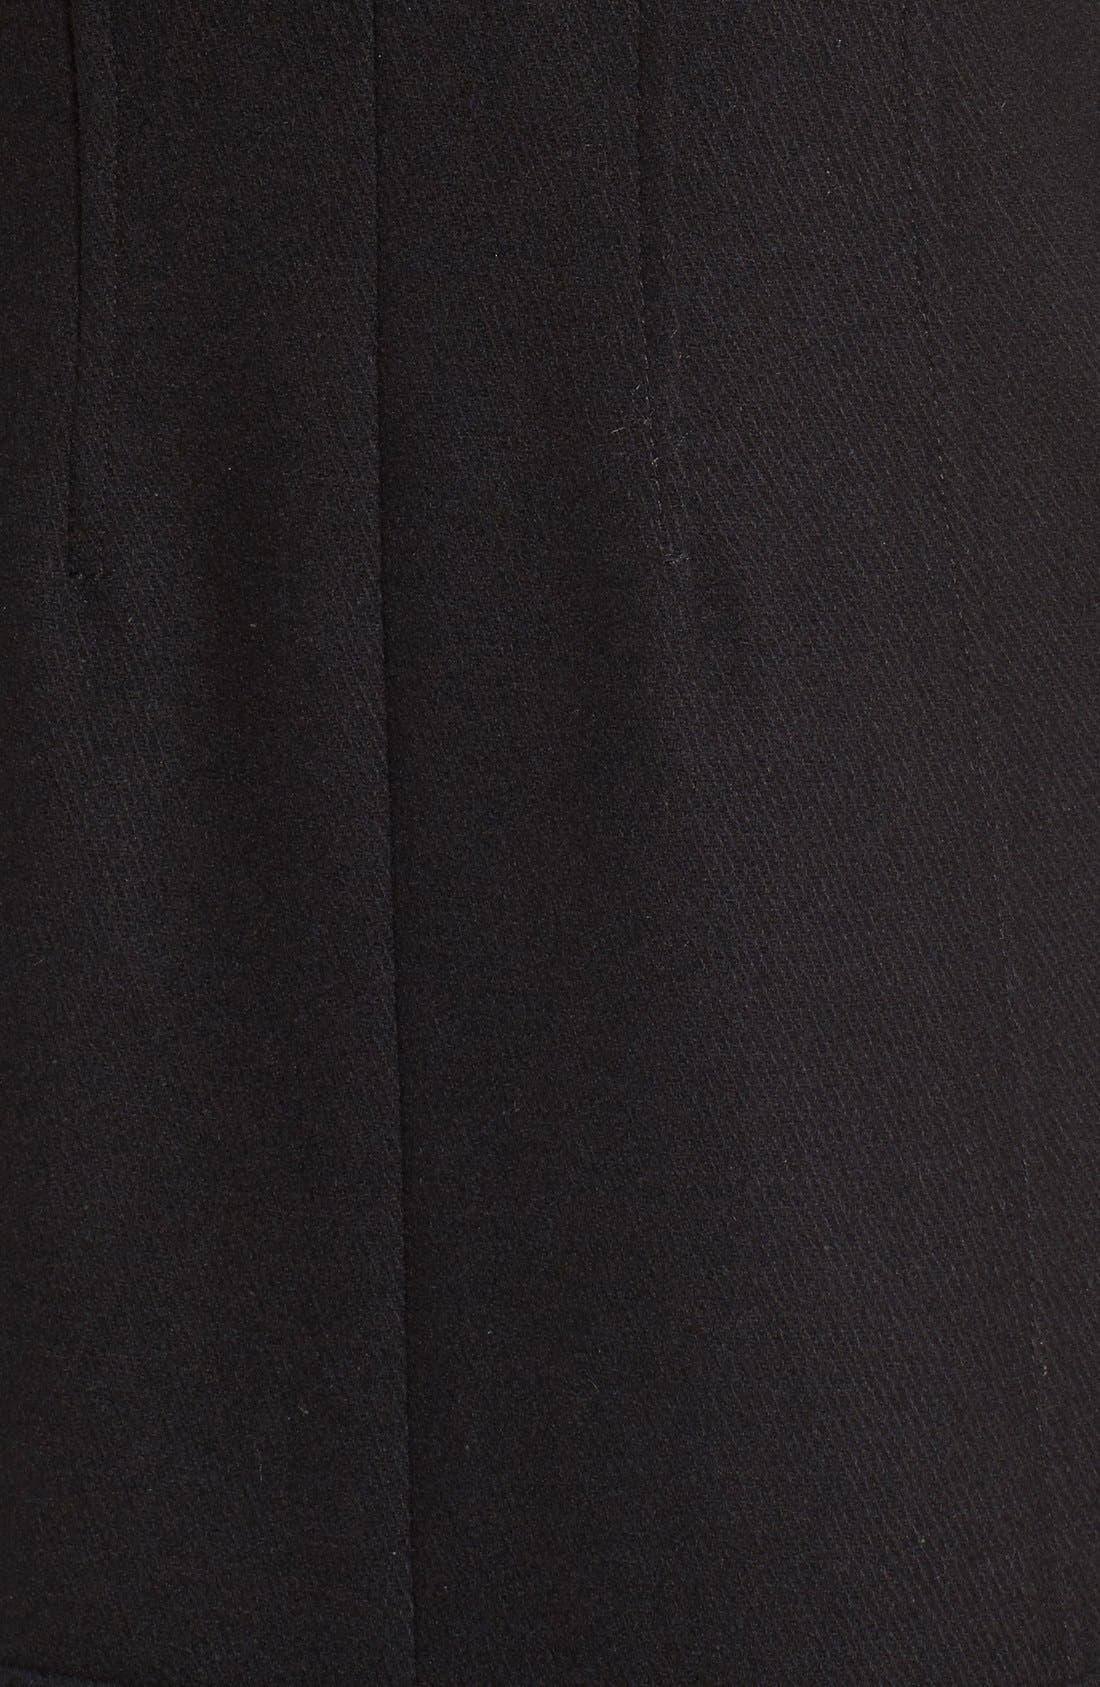 Bouclé Sleeve Wool Blend Military Coat,                             Alternate thumbnail 5, color,                             Black